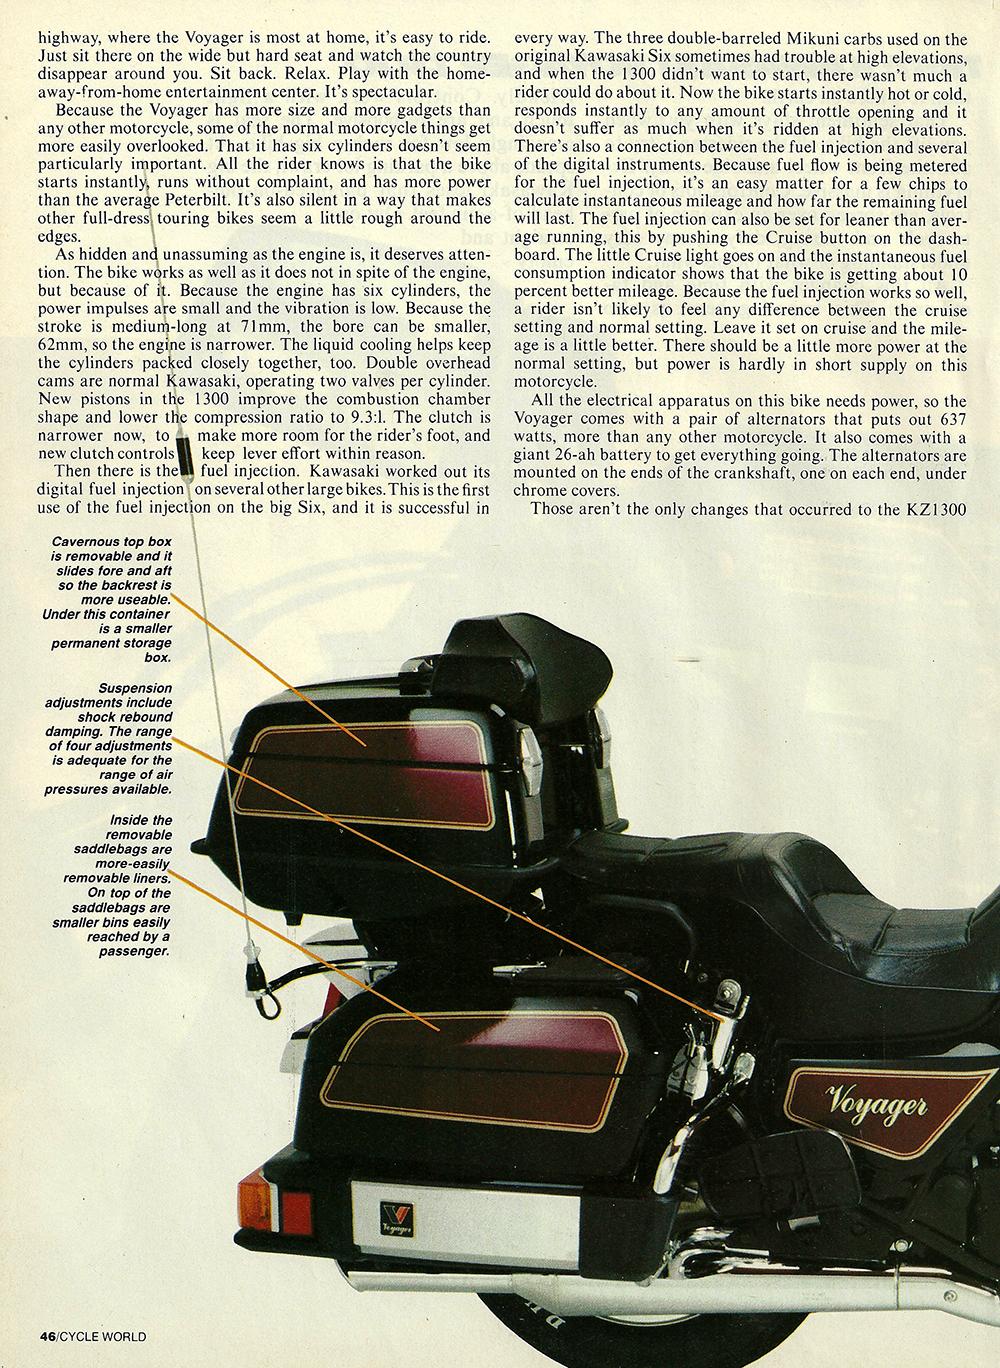 1983 Kawasaki Voyager 1300 road test 03.jpg